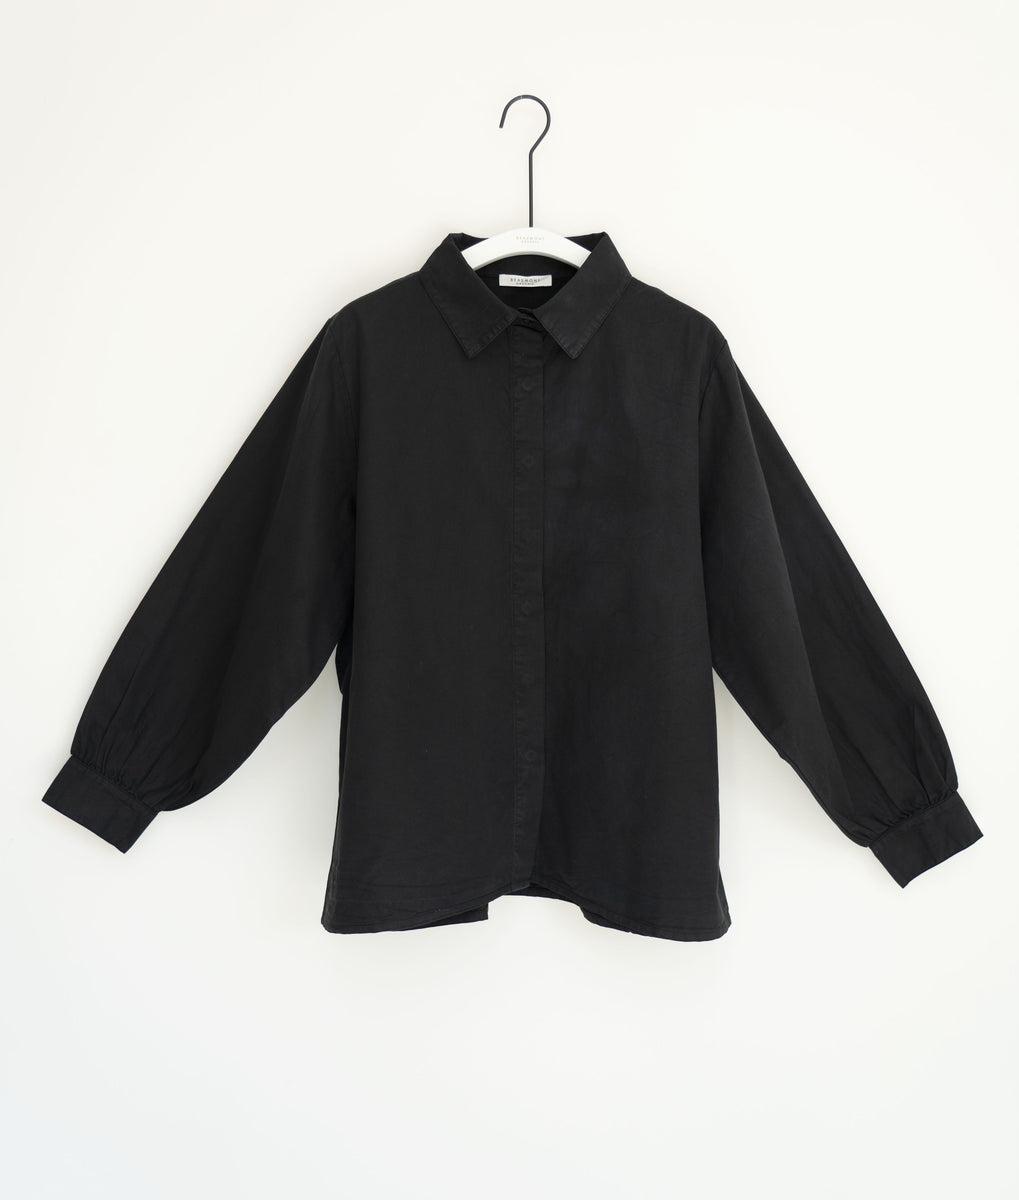 Celia Organic Cotton & Tencel Shirt In Black